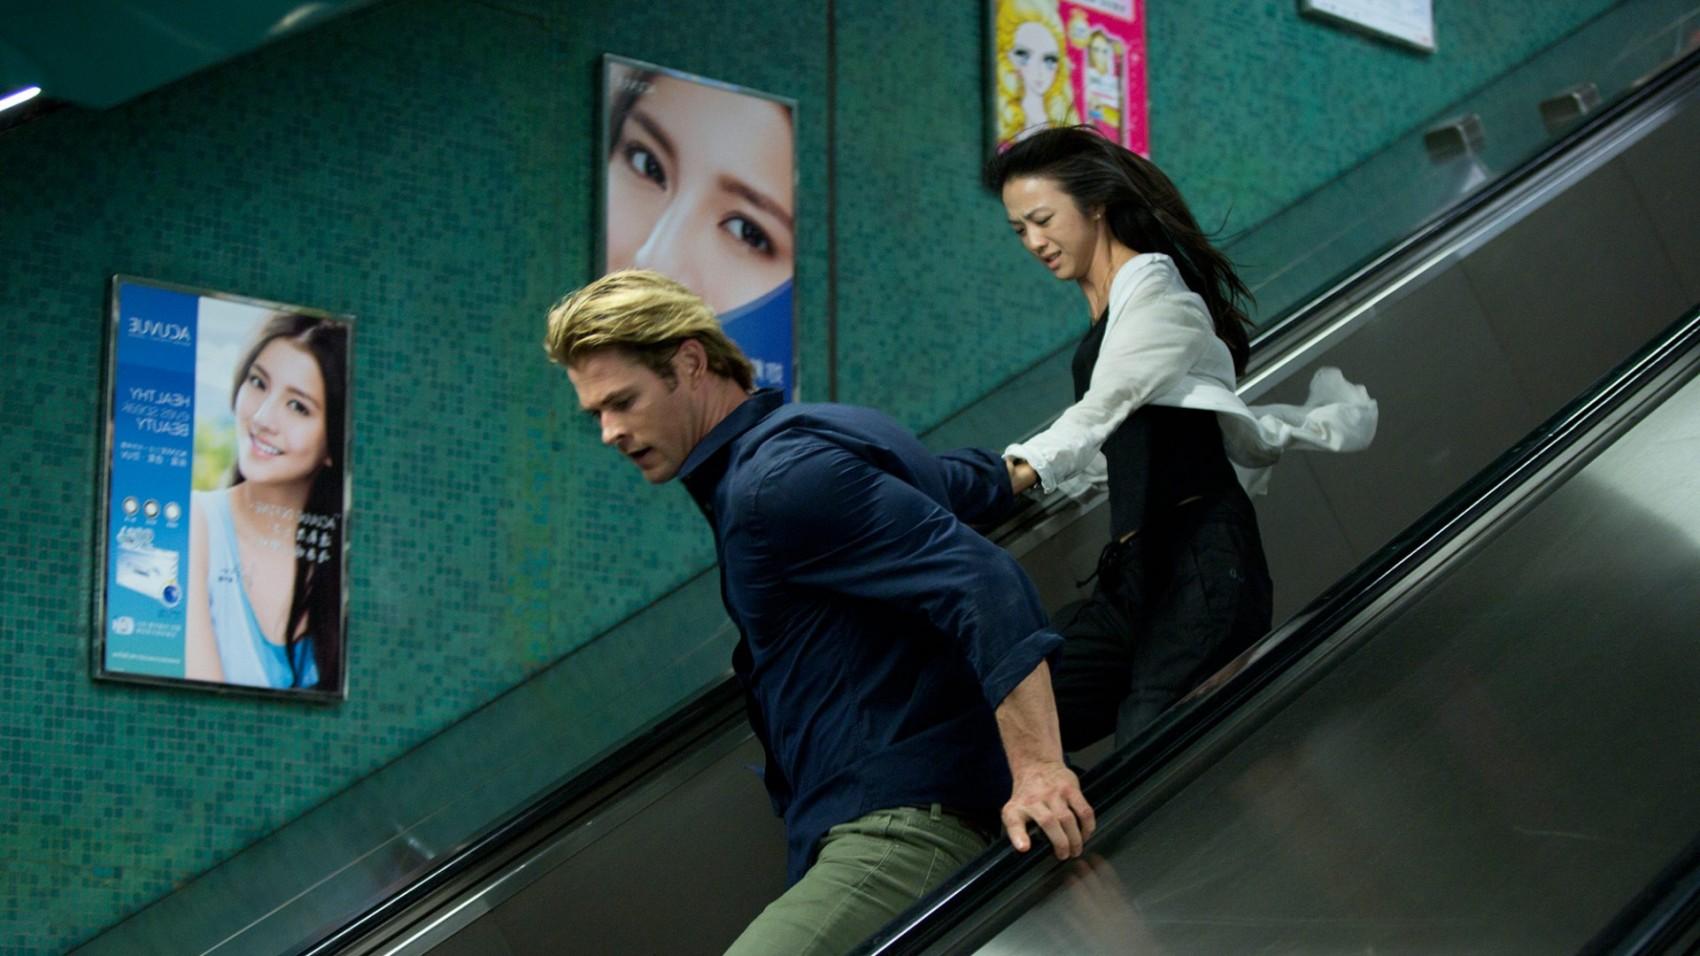 Chris-Hemsworth-And-Tang-Wei-Movie-BlackHat